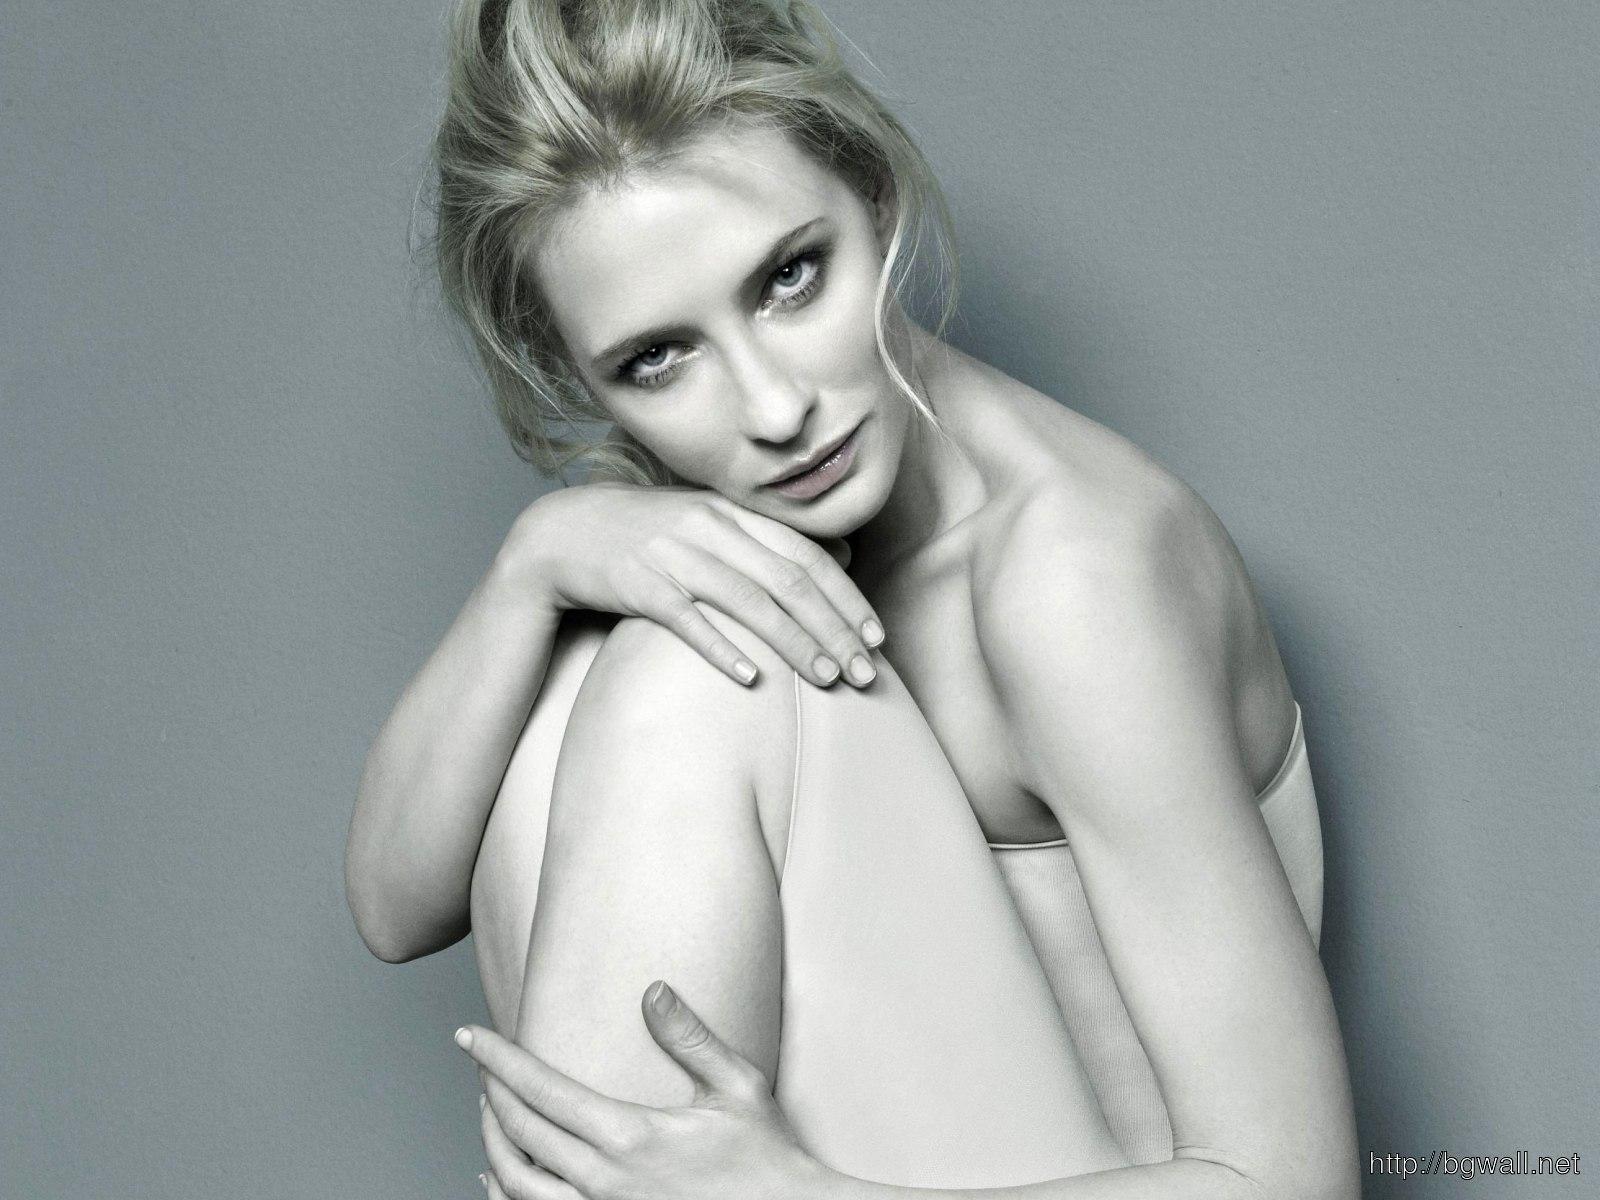 Cate Blanchett Wallpapers Full Size